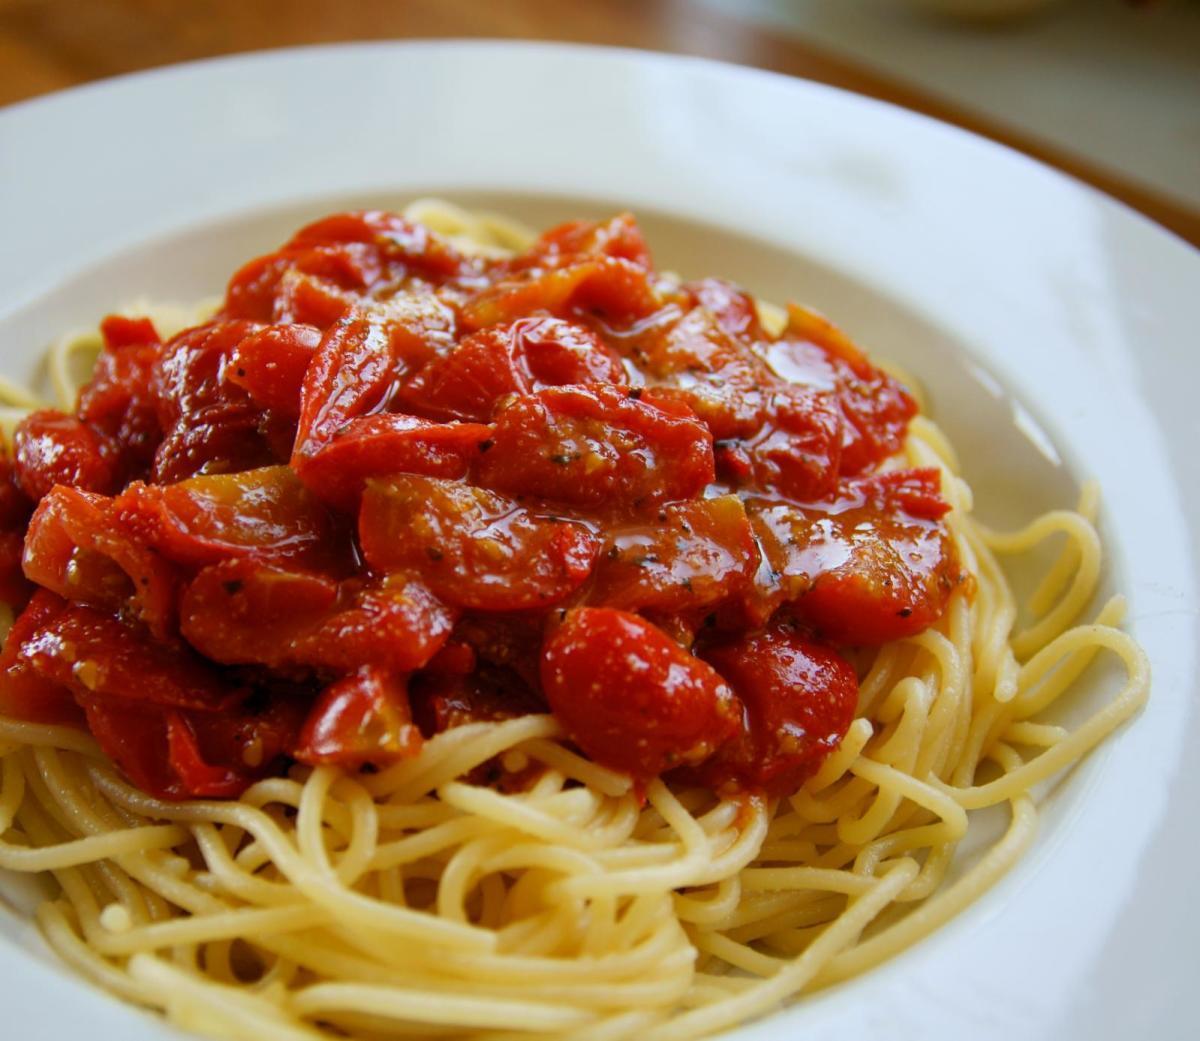 Gluten-free spaghetti.